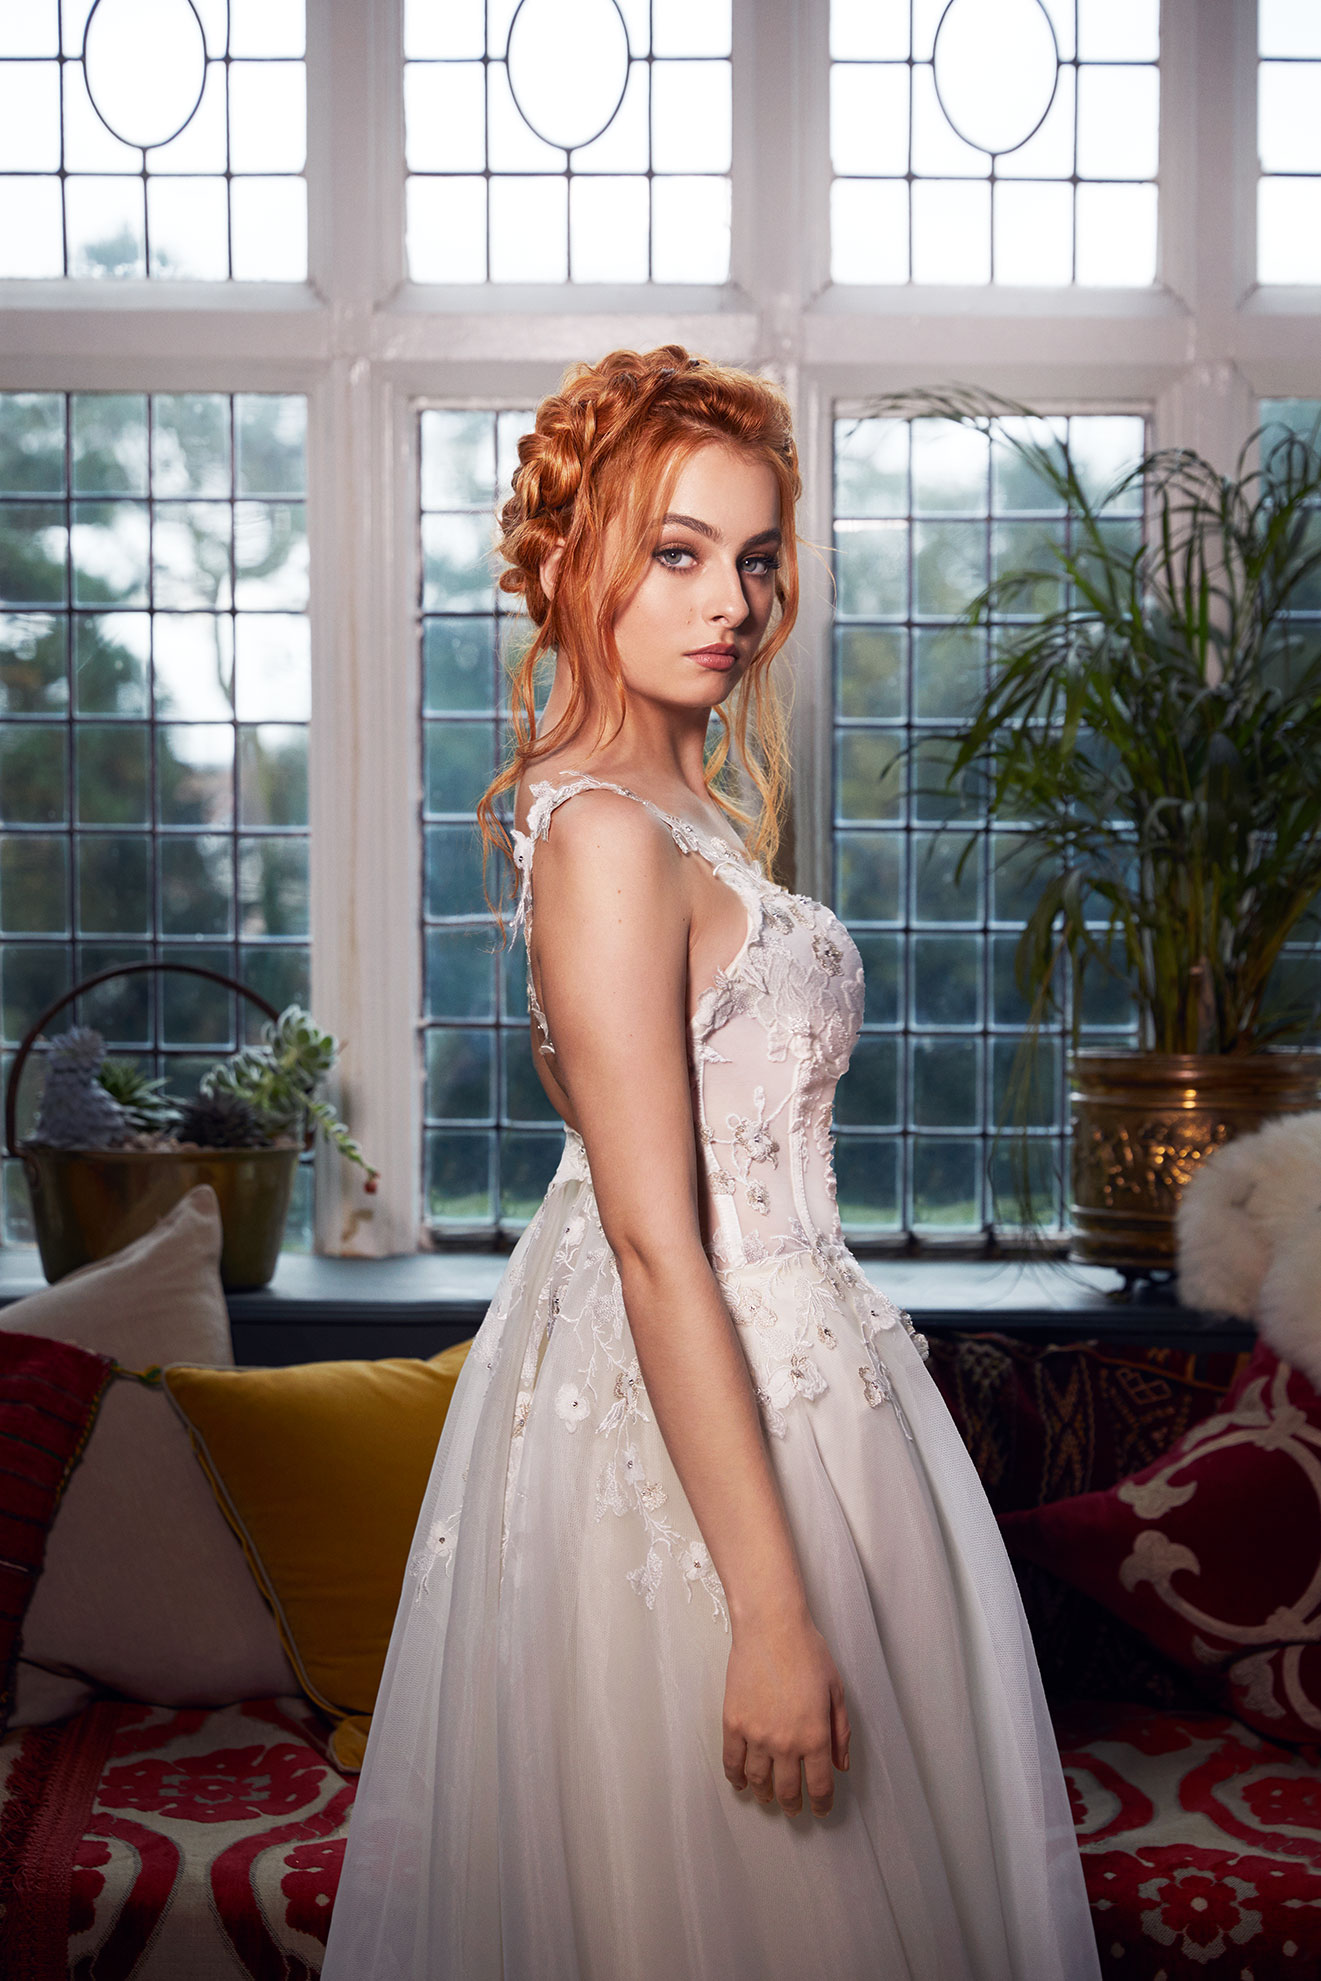 Bridal hair extension - light